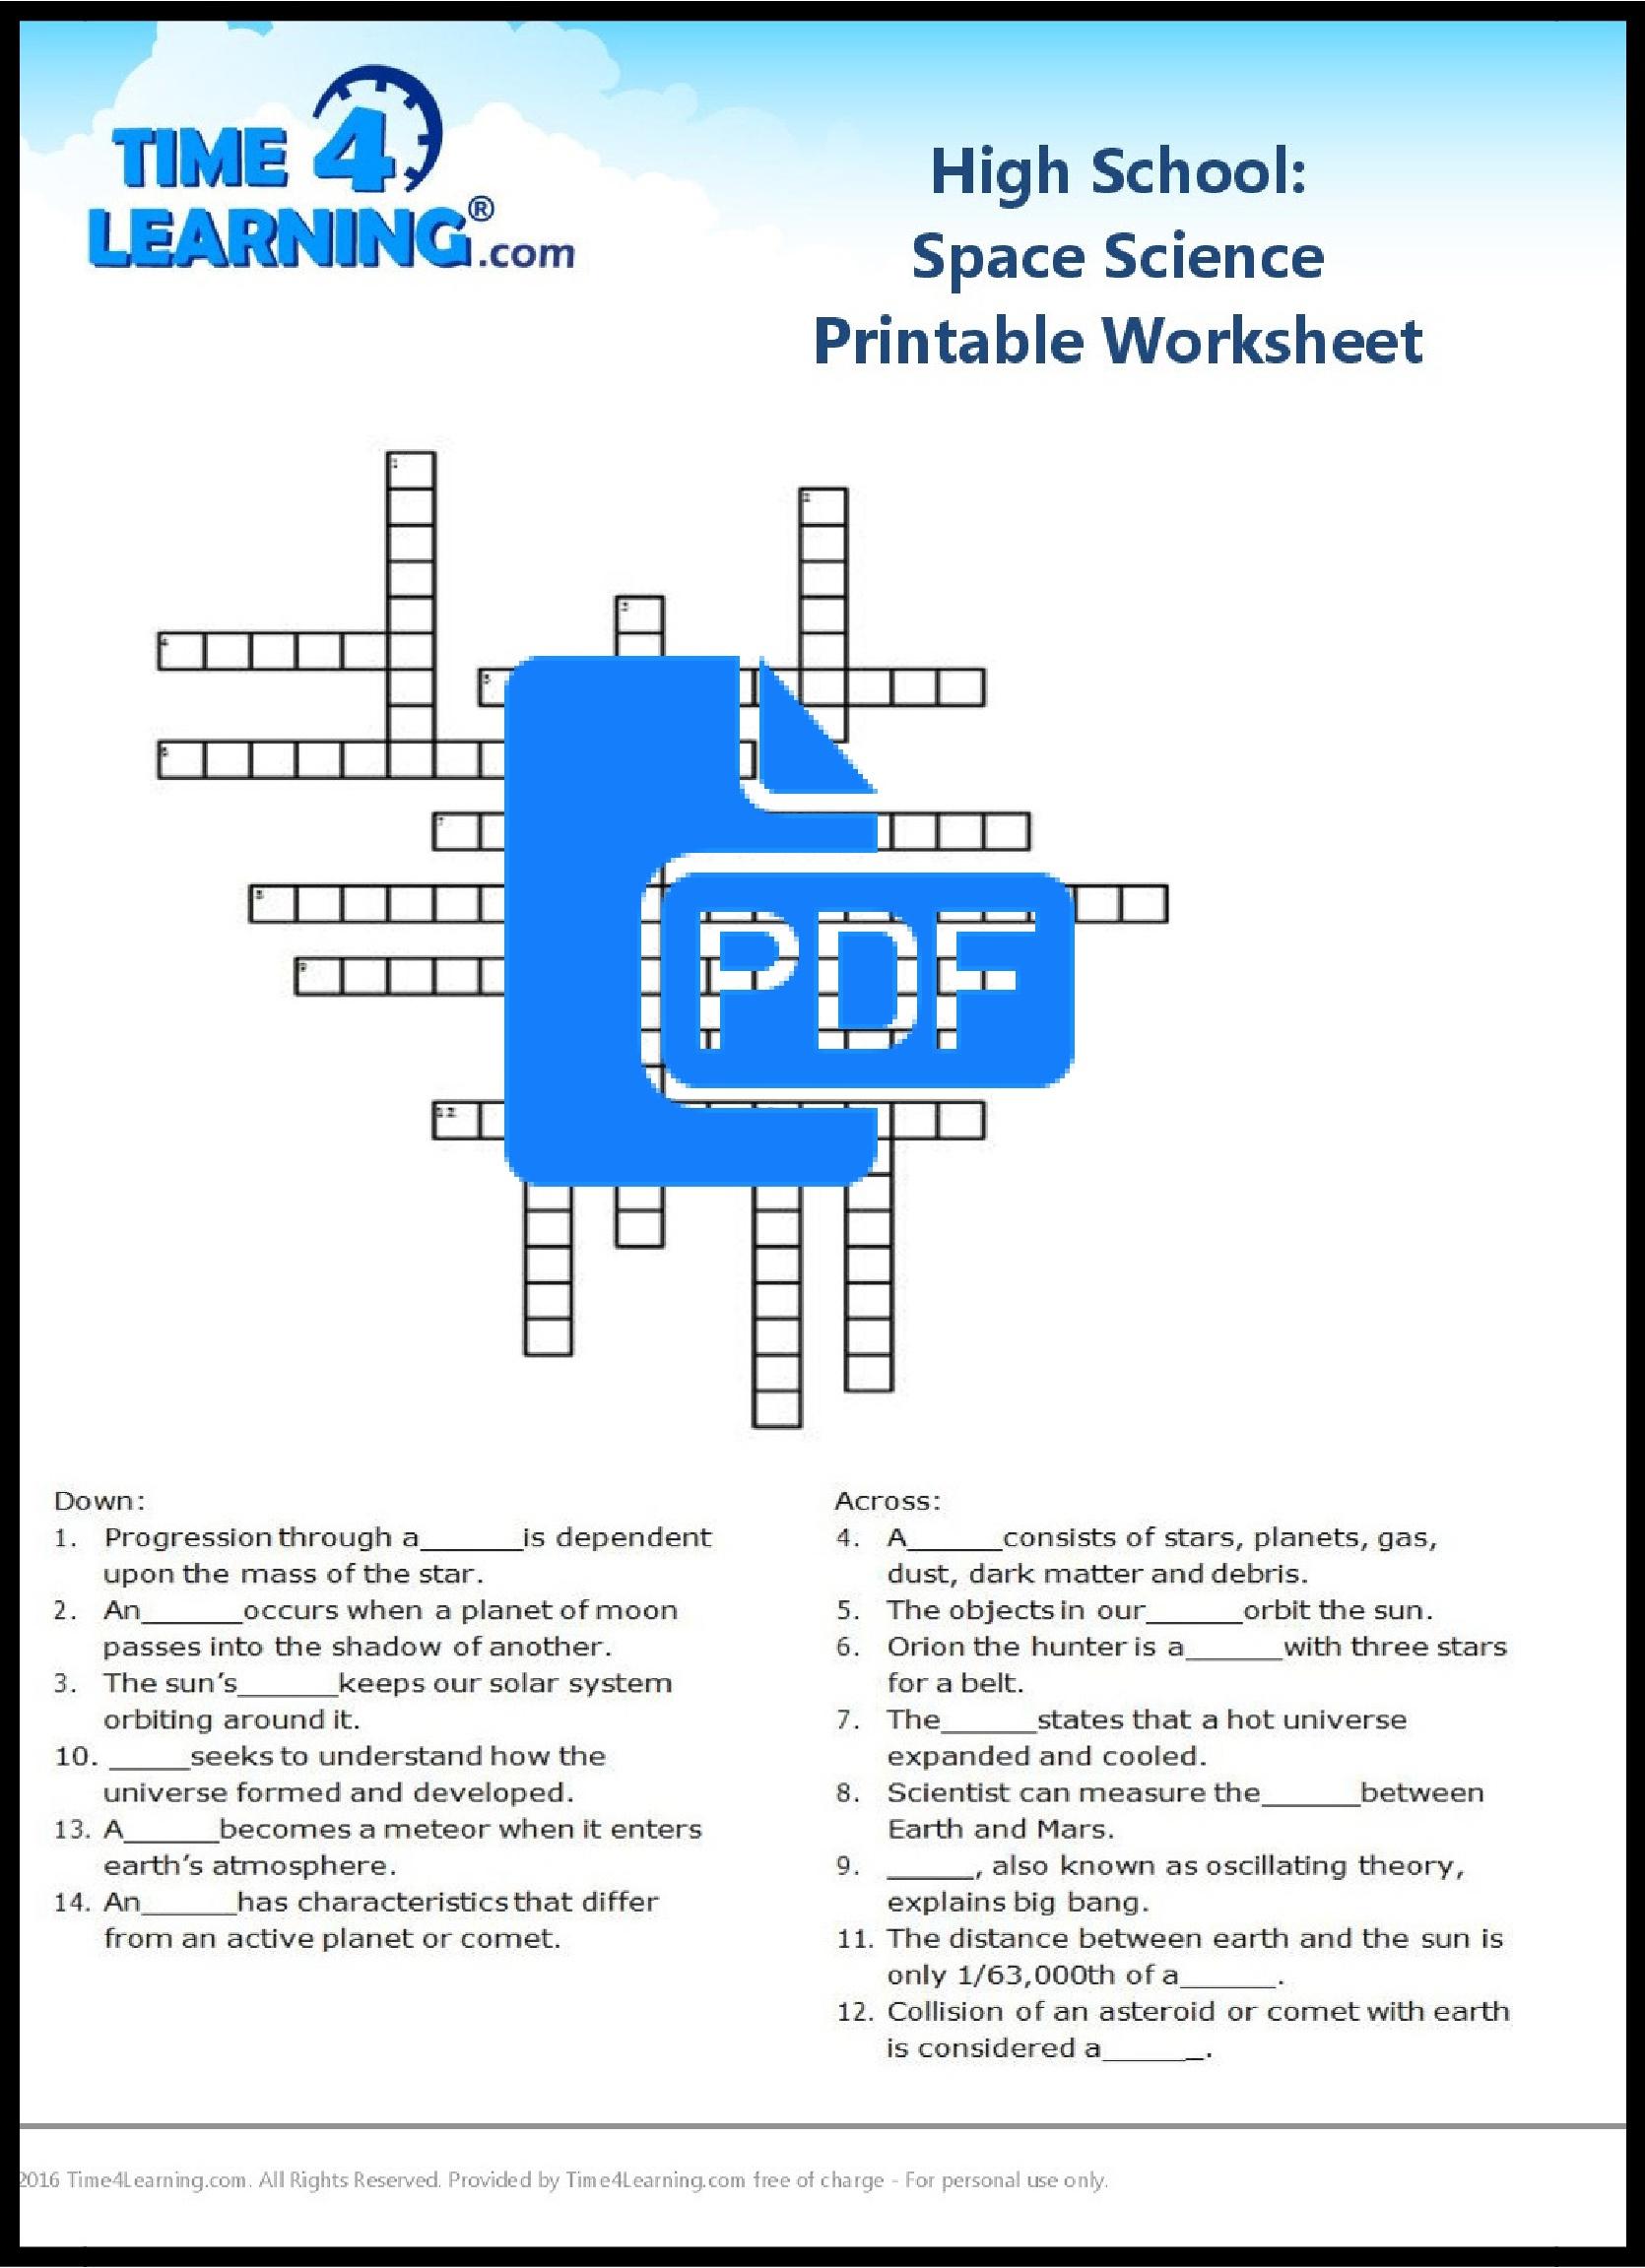 Free Printable: High School Space Science Worksheet | Time4Learning | Free Printable Science Worksheets